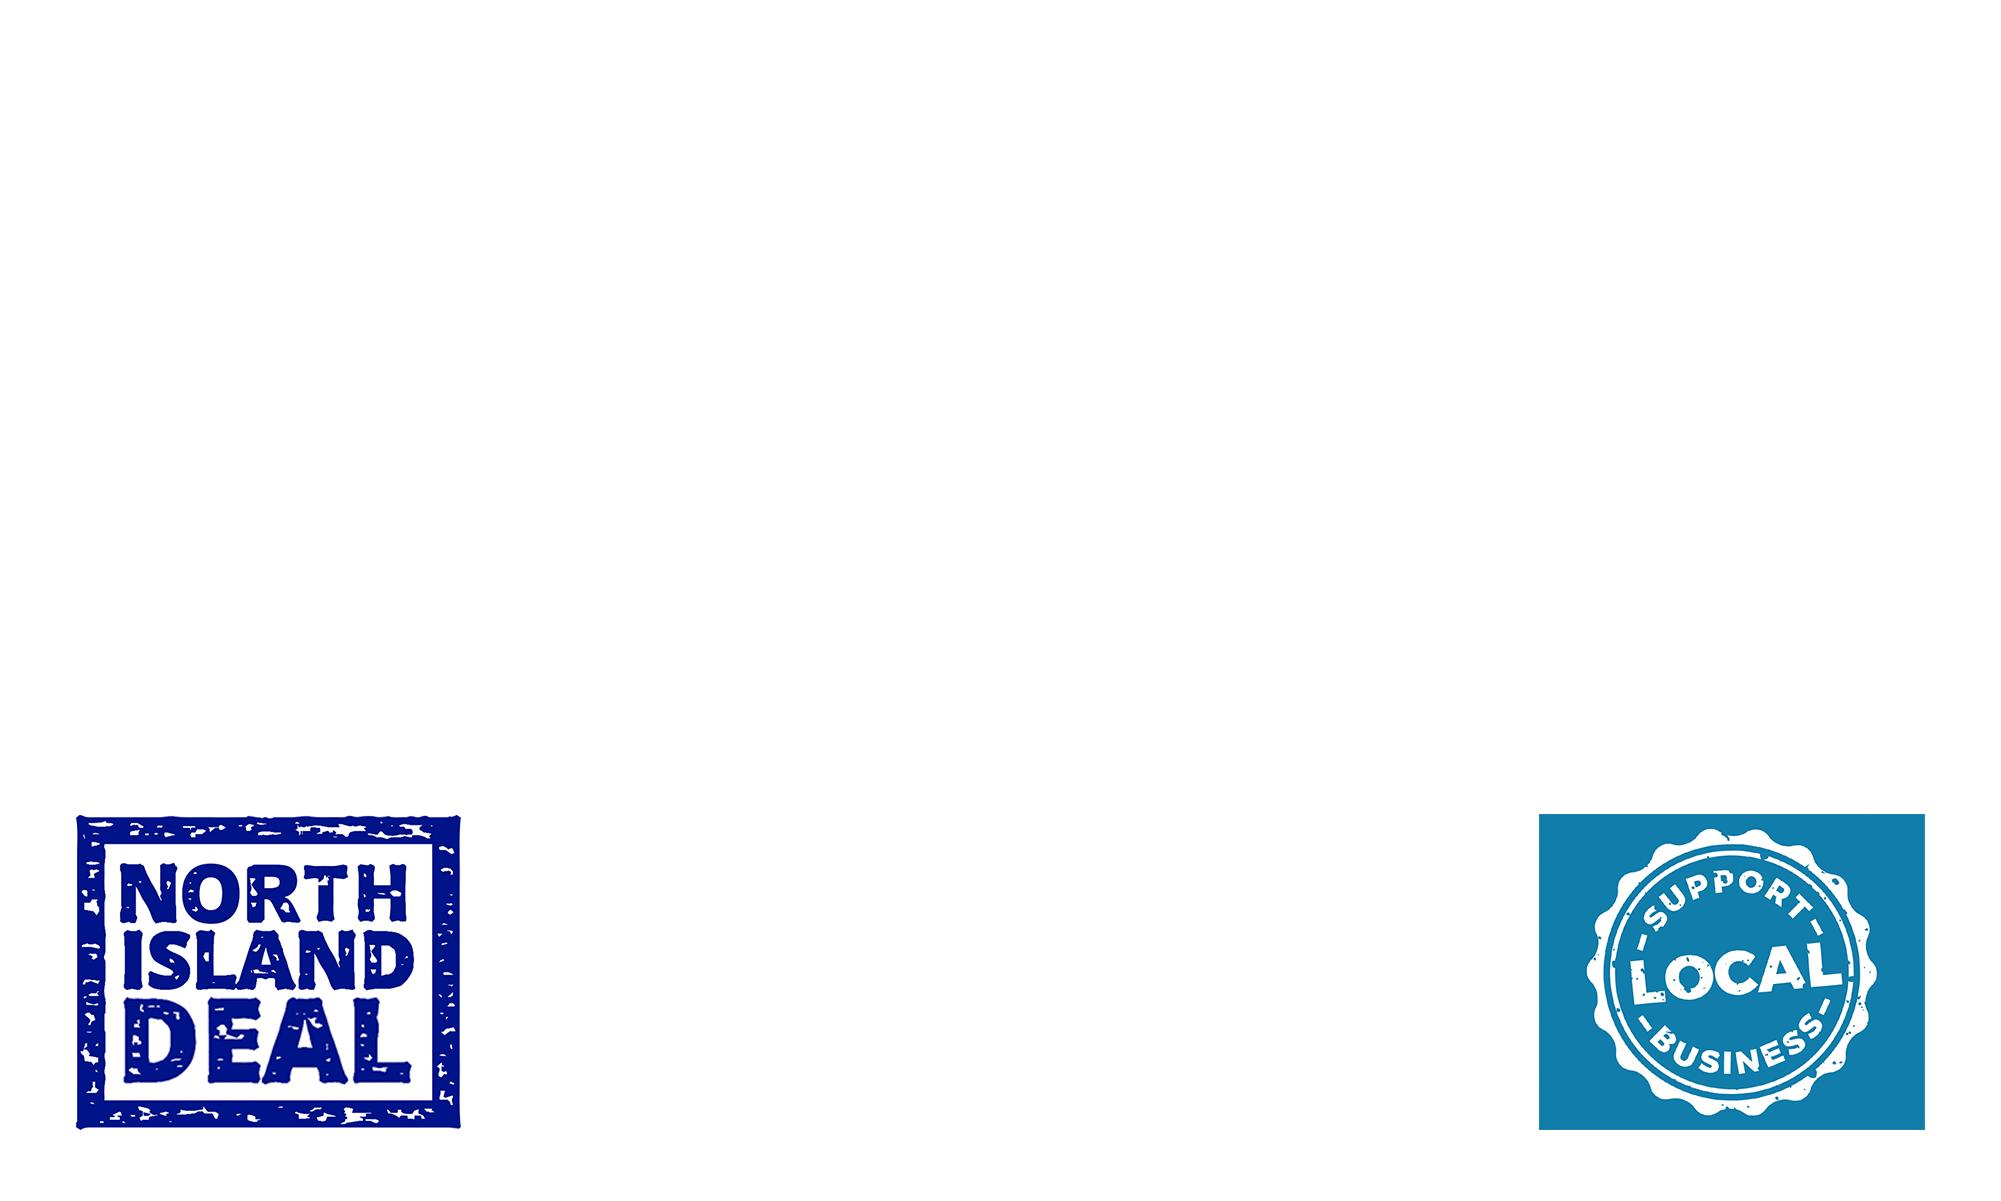 North island support logo overlay